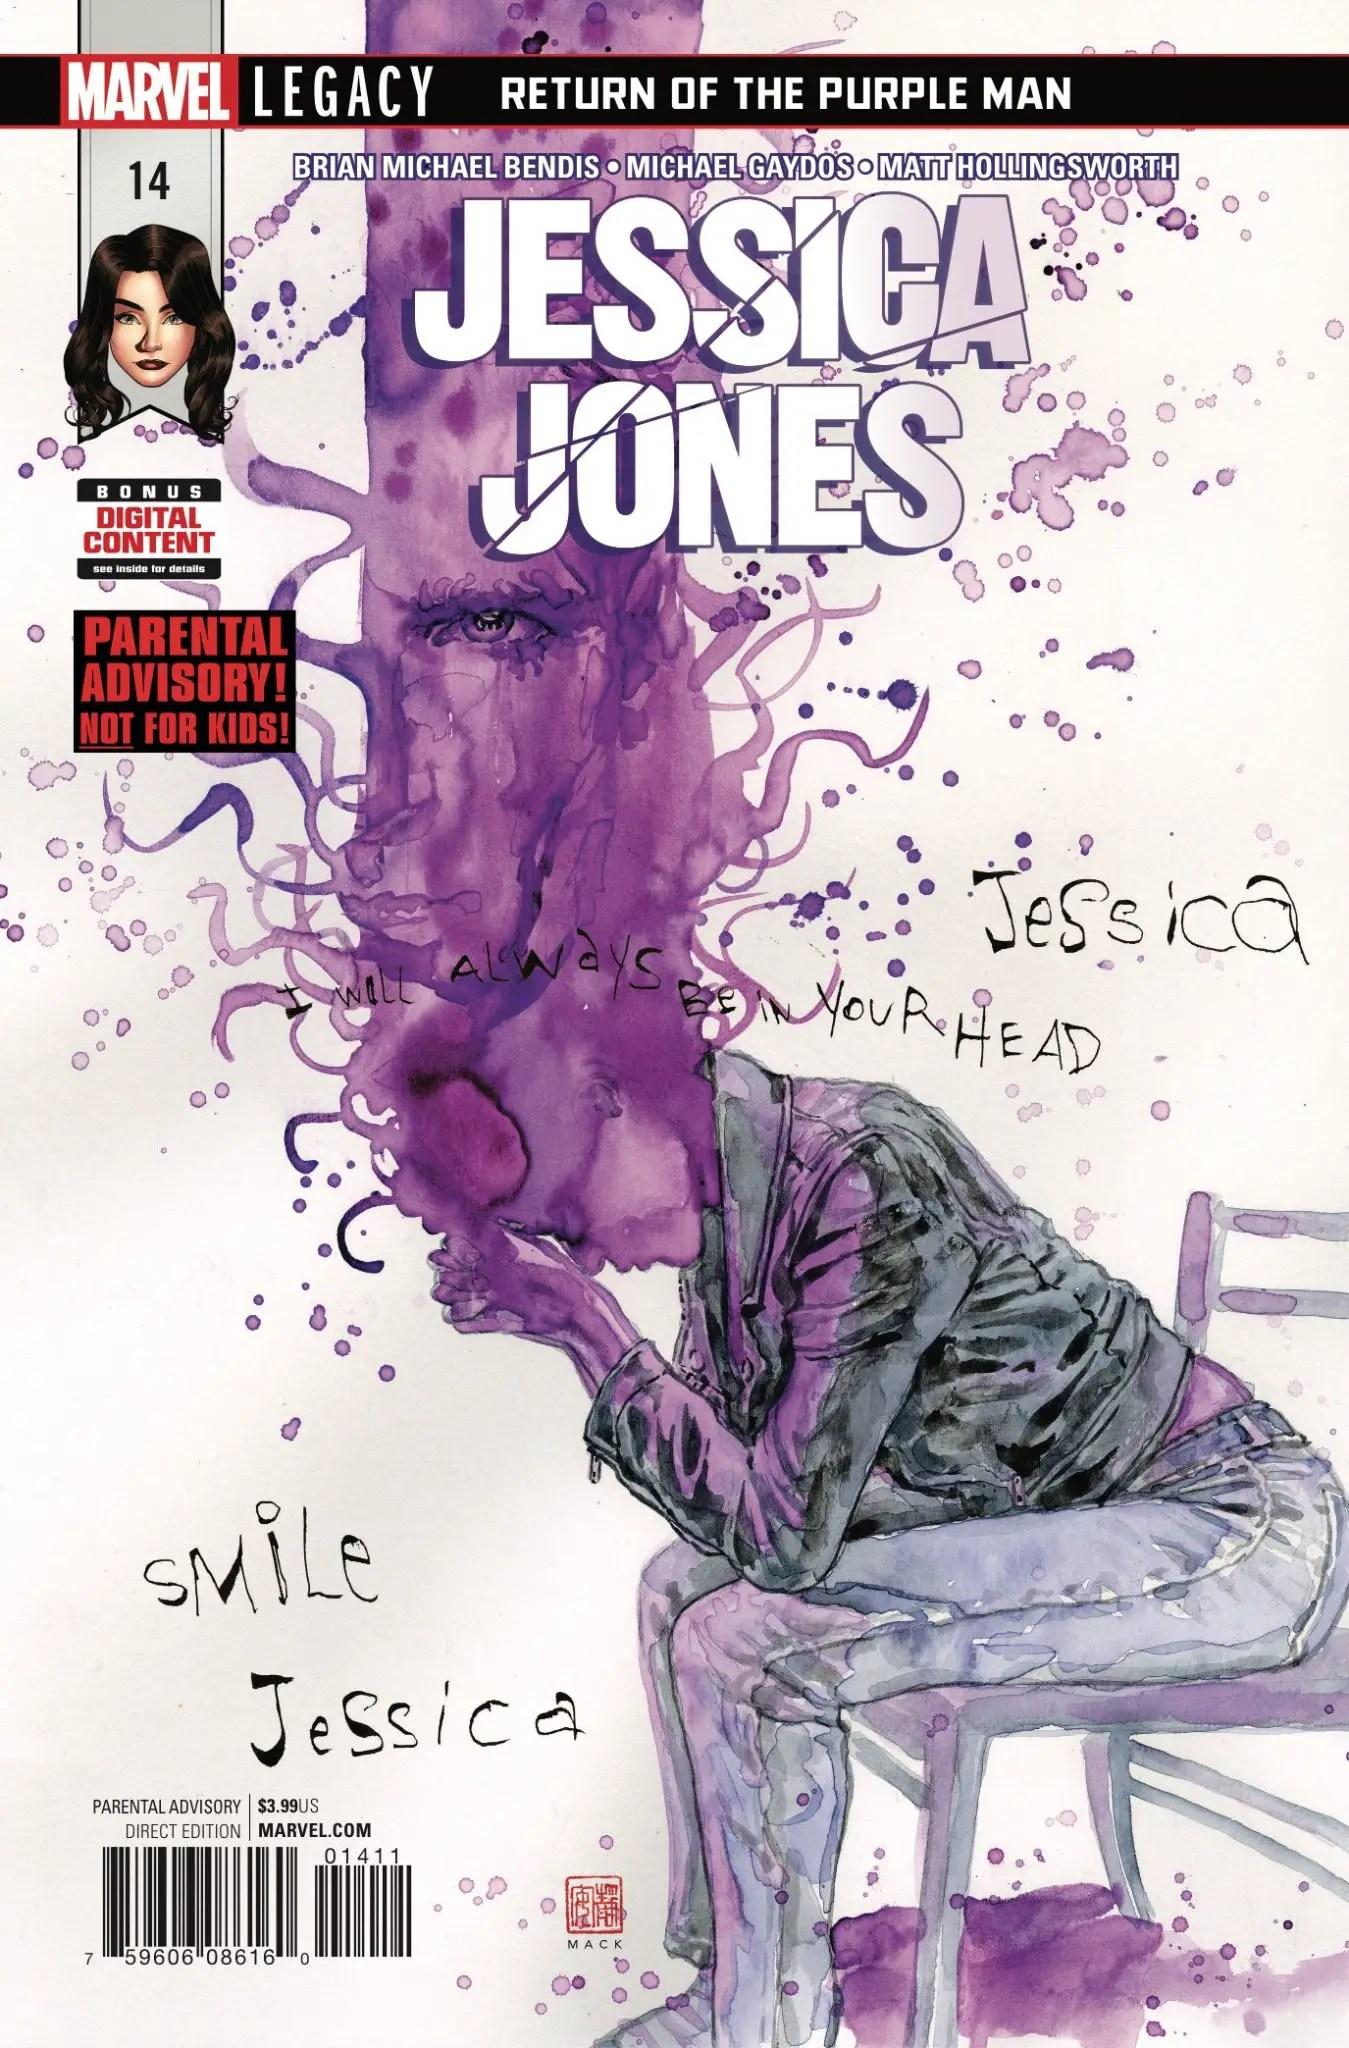 Jessica Jones #14 Review